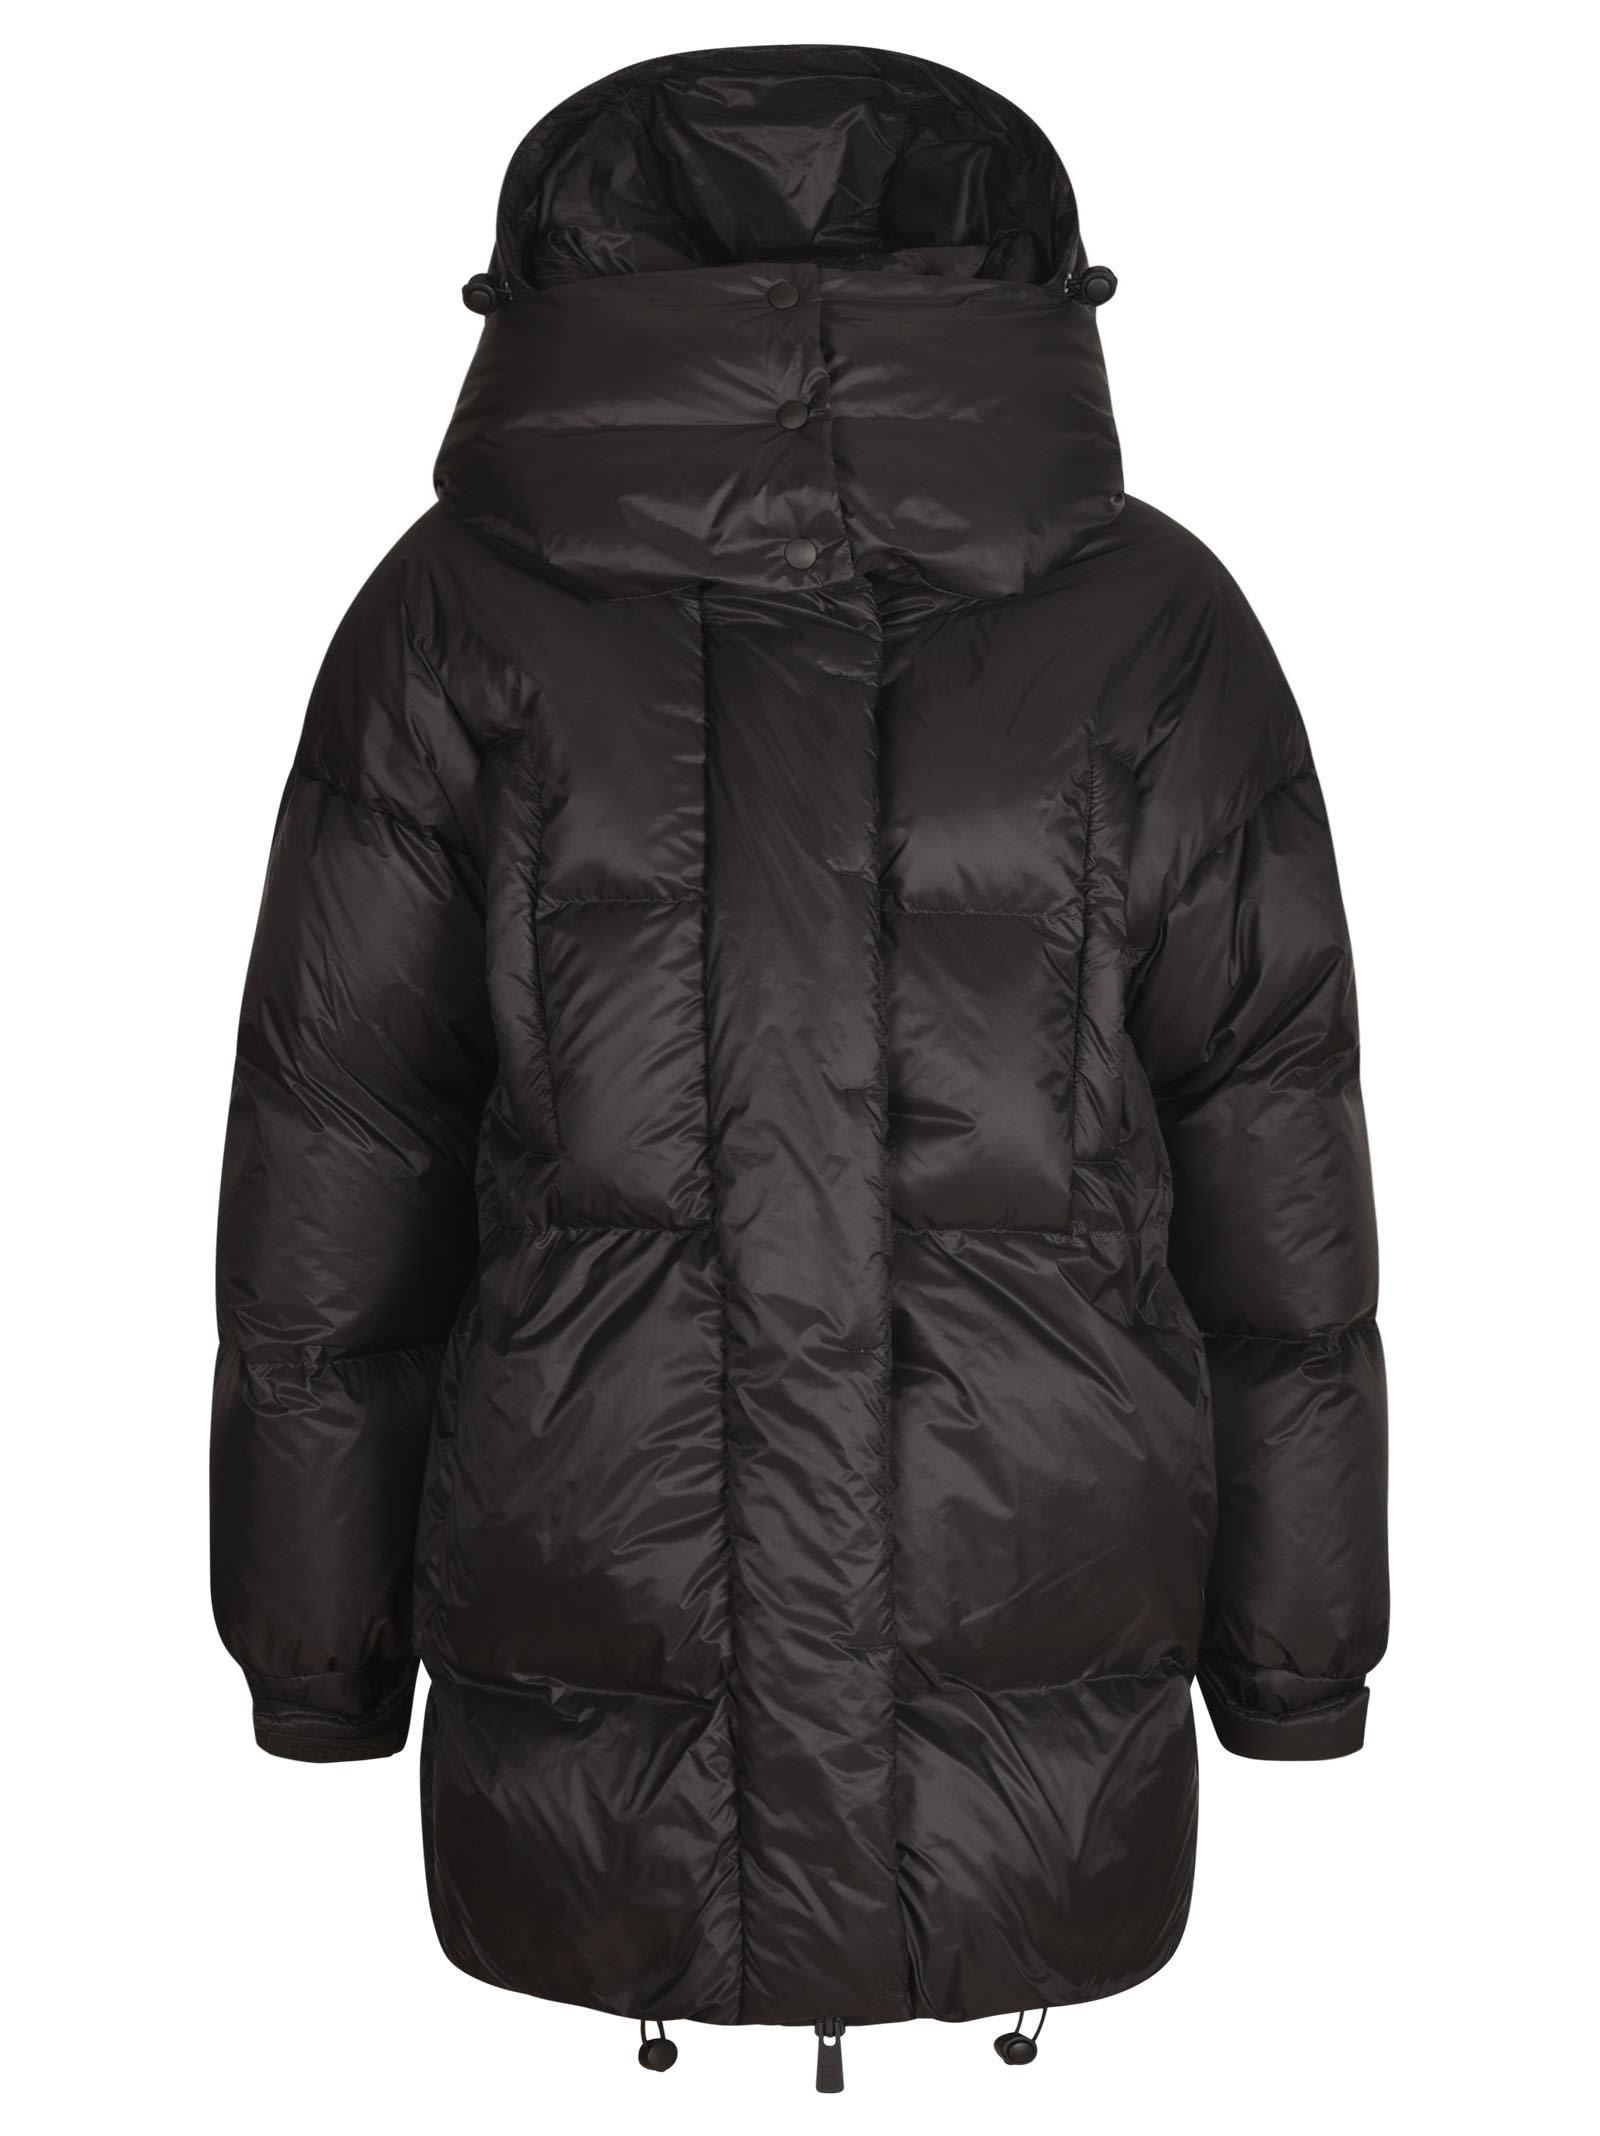 Bacon Superwalt Puffer Jacket In Black